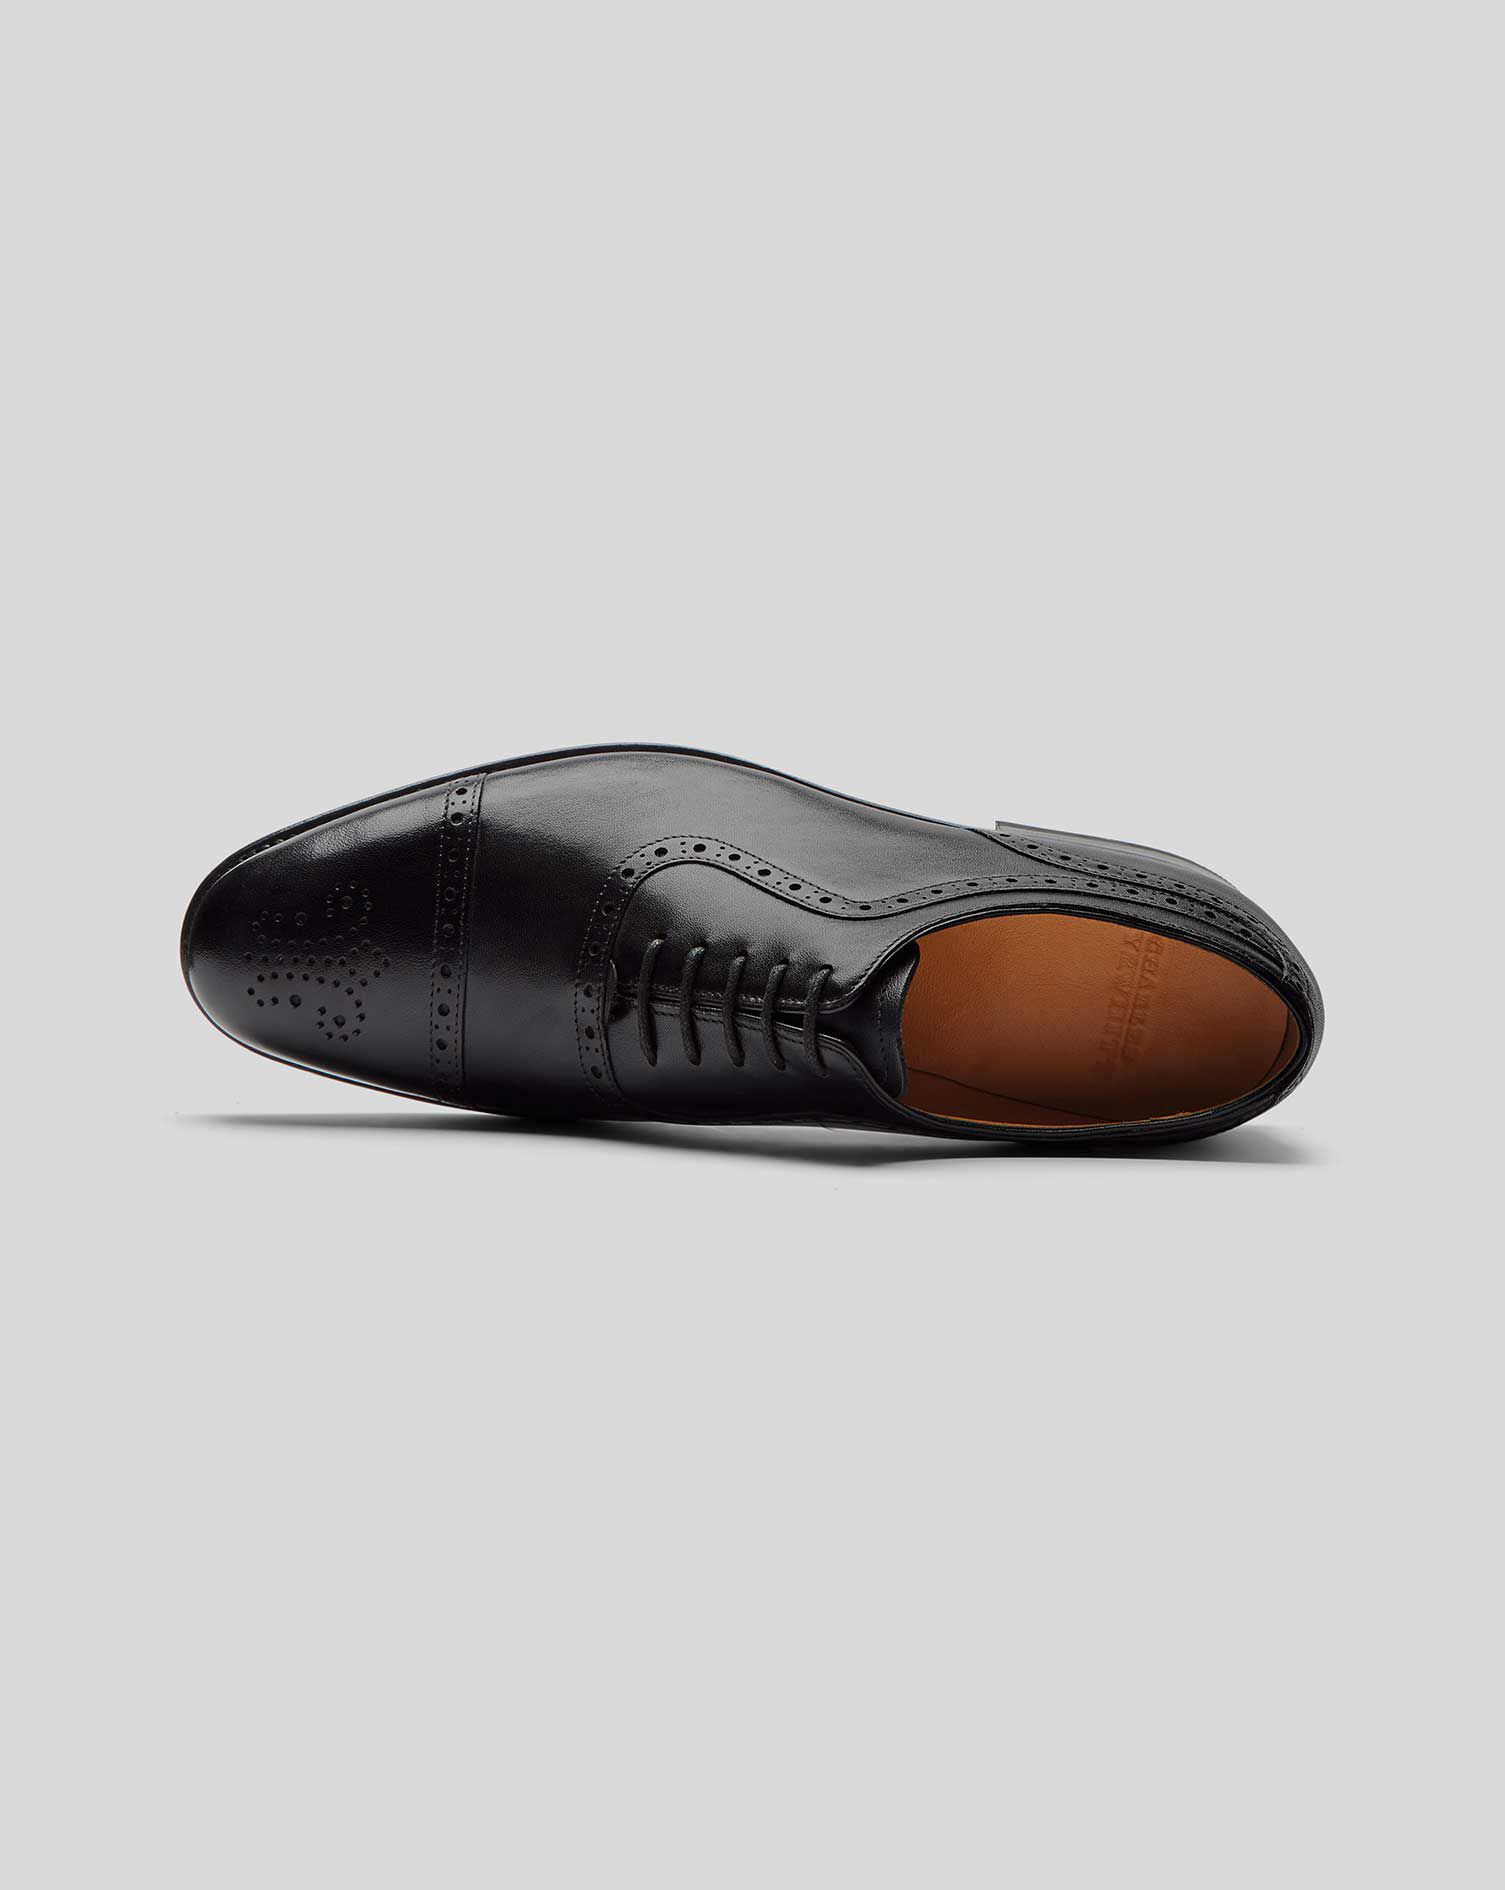 Goodyear rahmengenähte Budapester Oxford Schuhe Schwarz